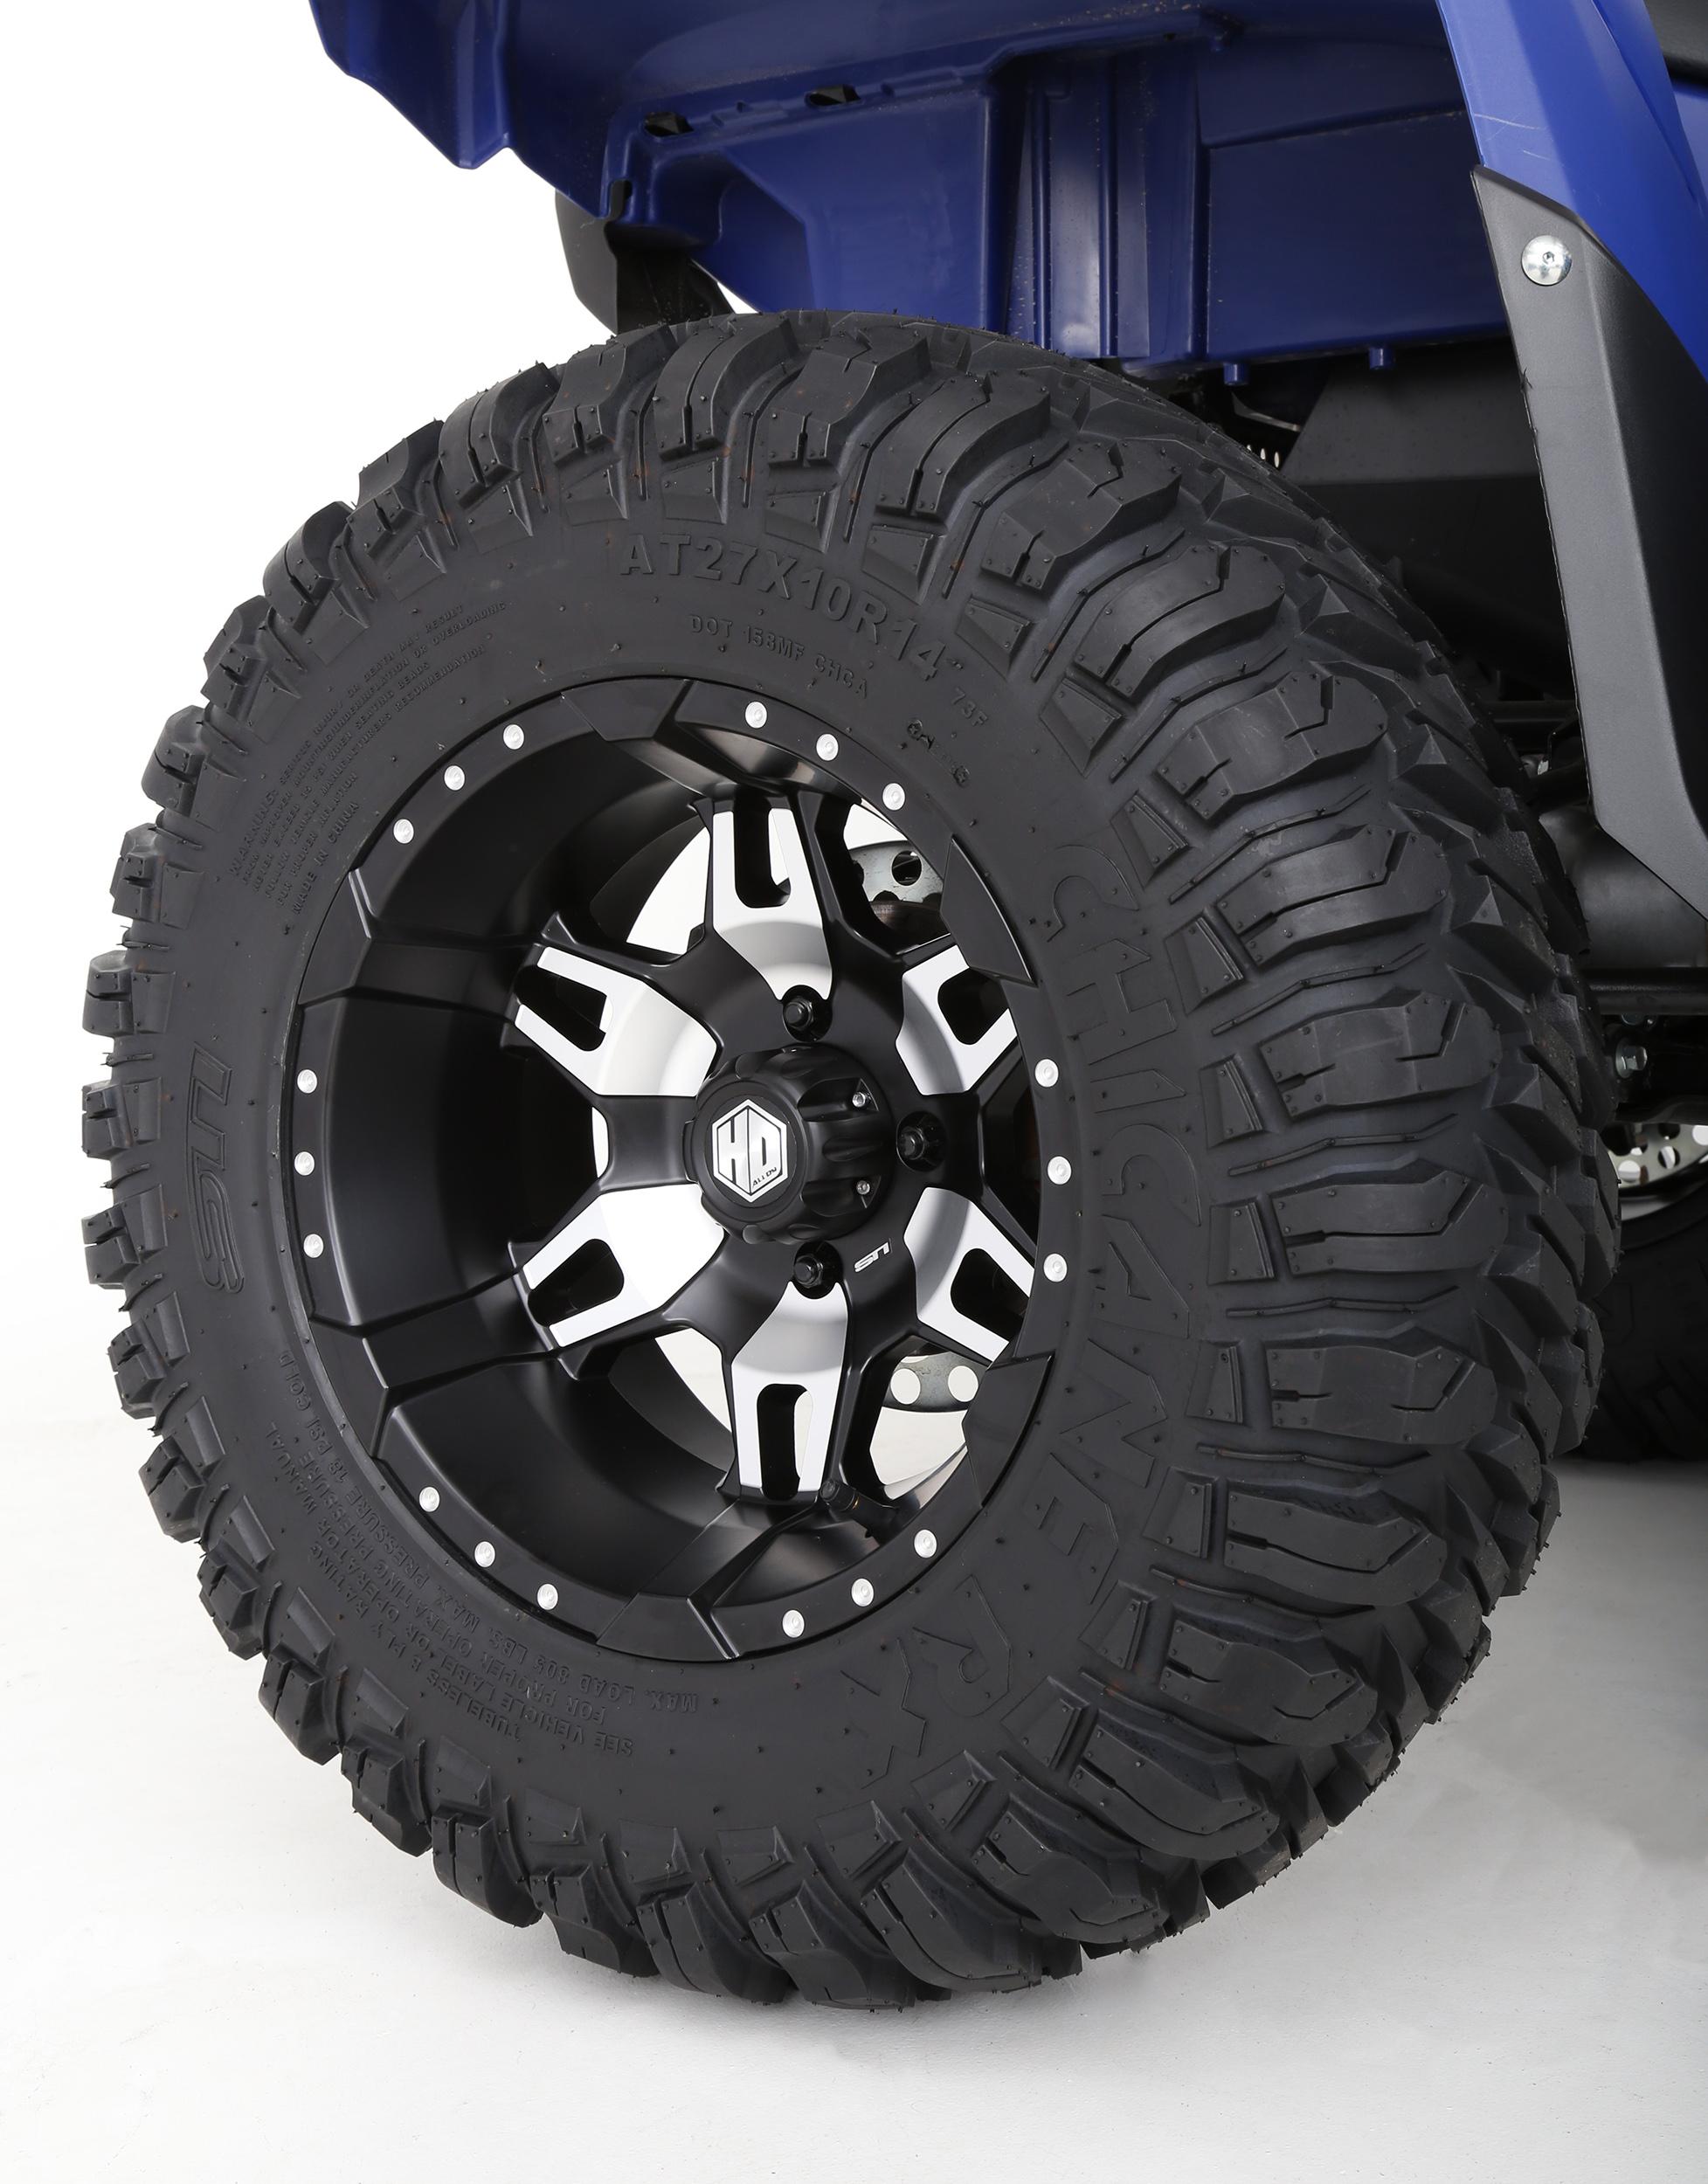 Chicane RX 27-inch